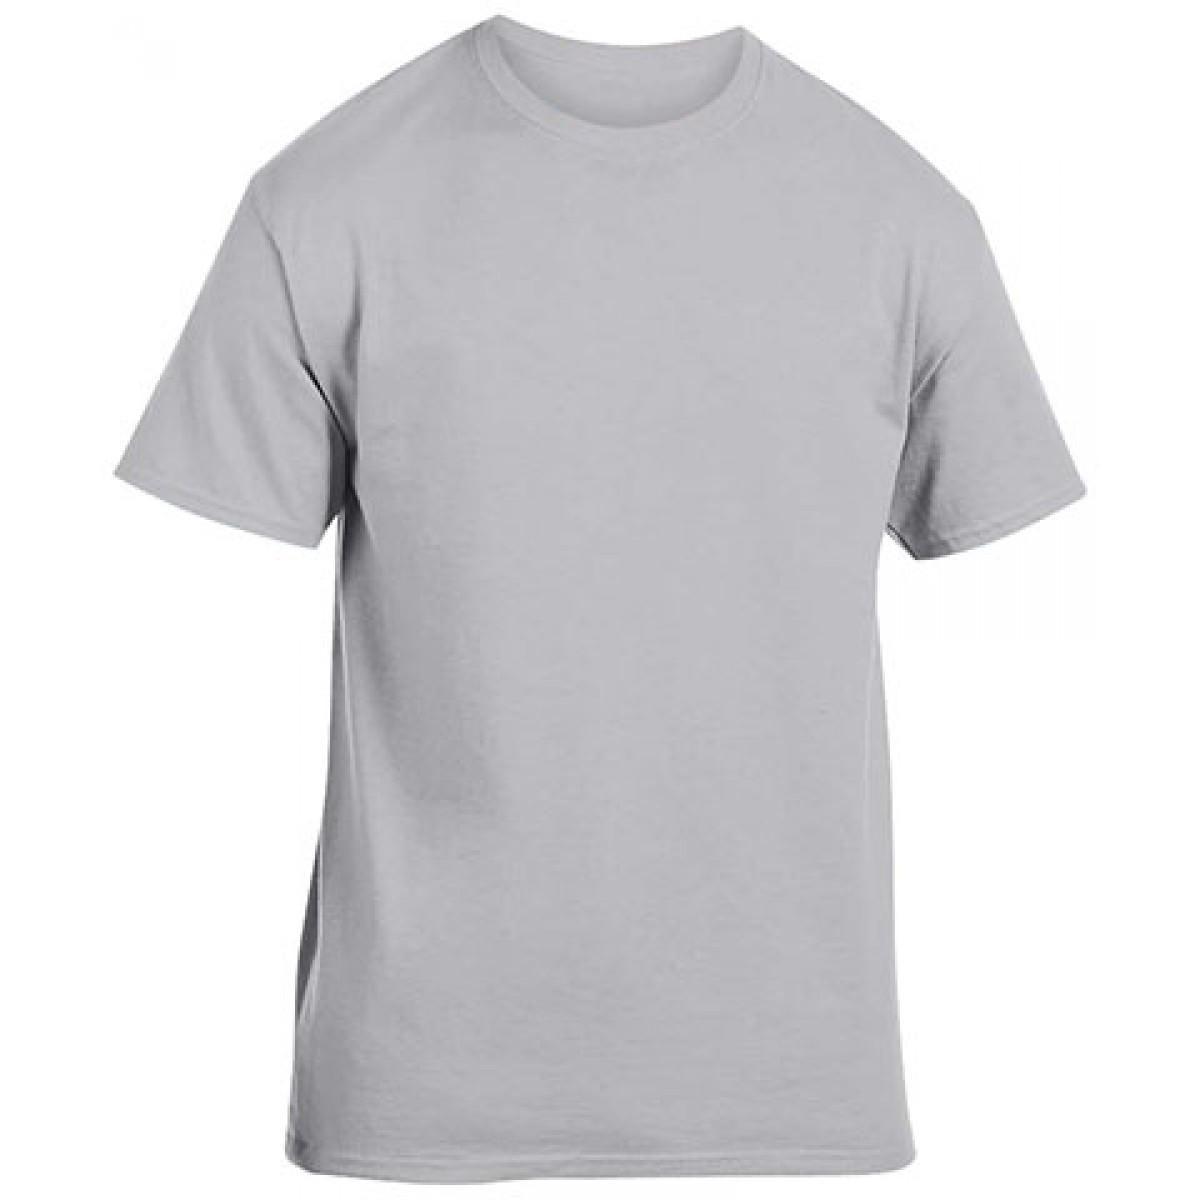 Cotton Short Sleeve T-Shirt-Ash-XS